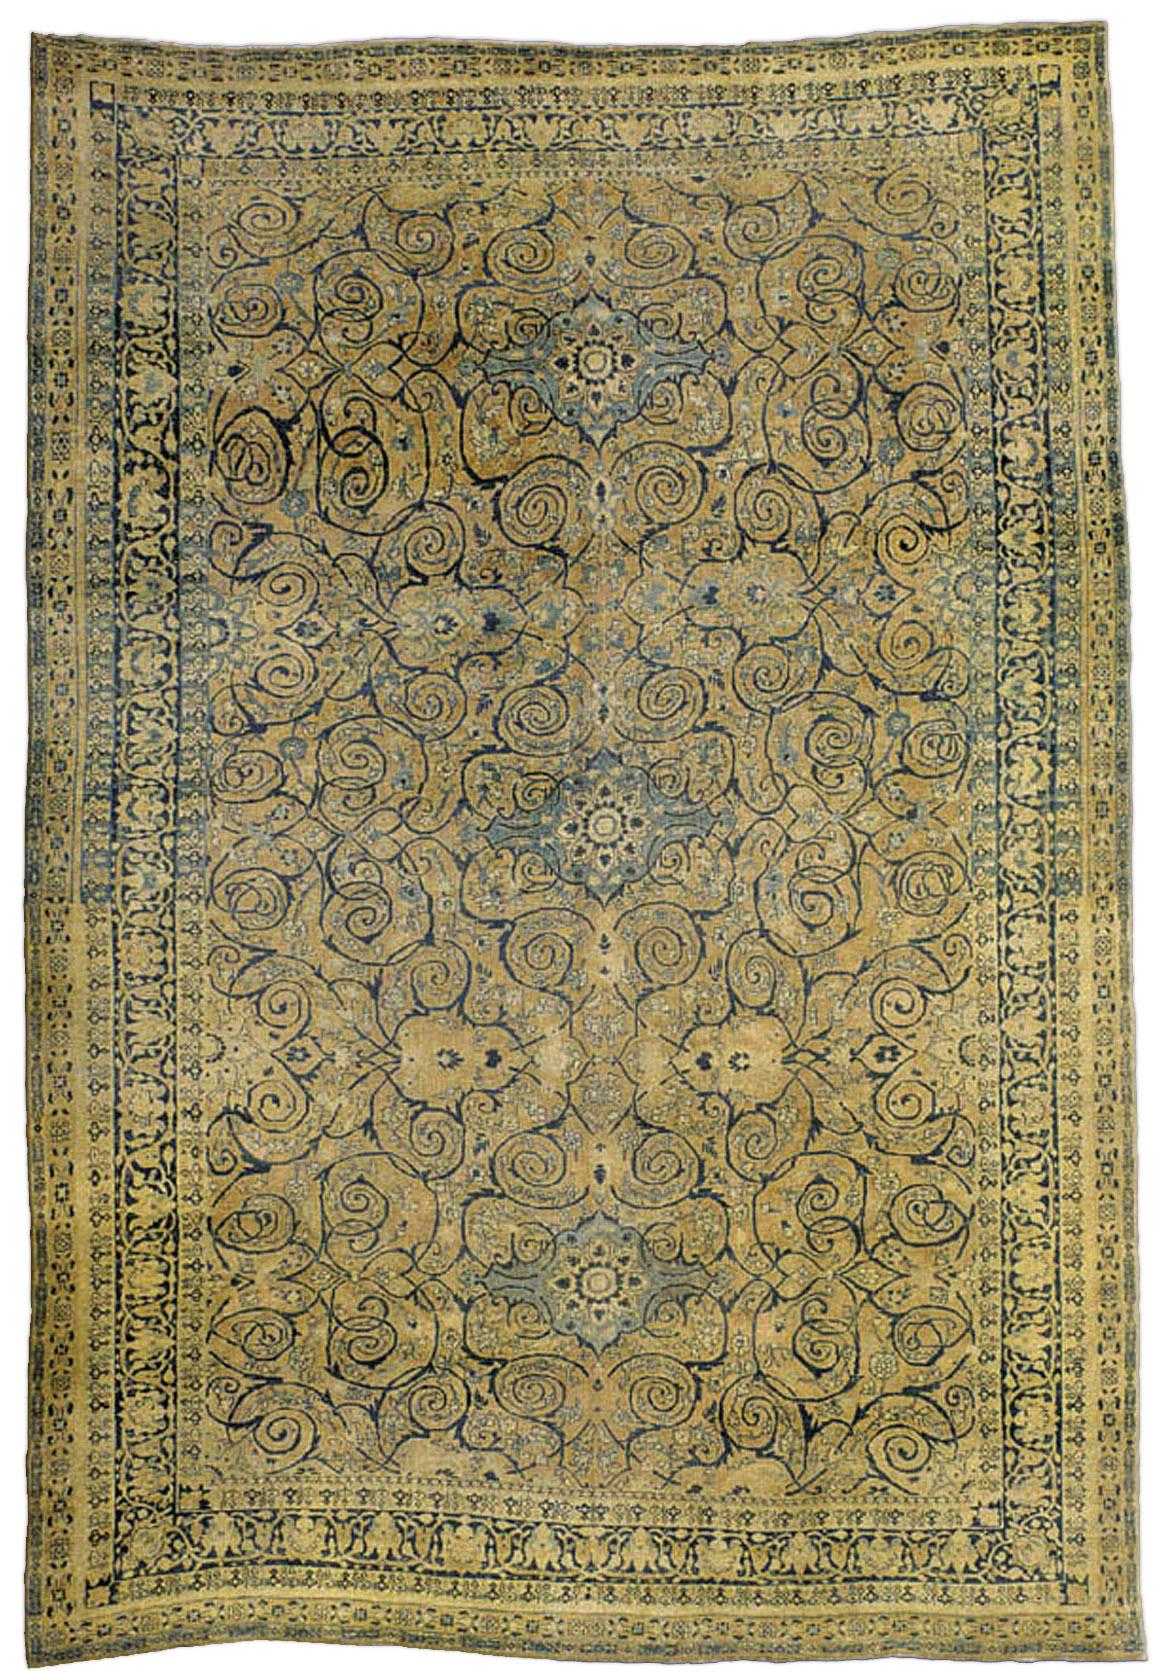 Antique Persian Tabriz Rug BB0826